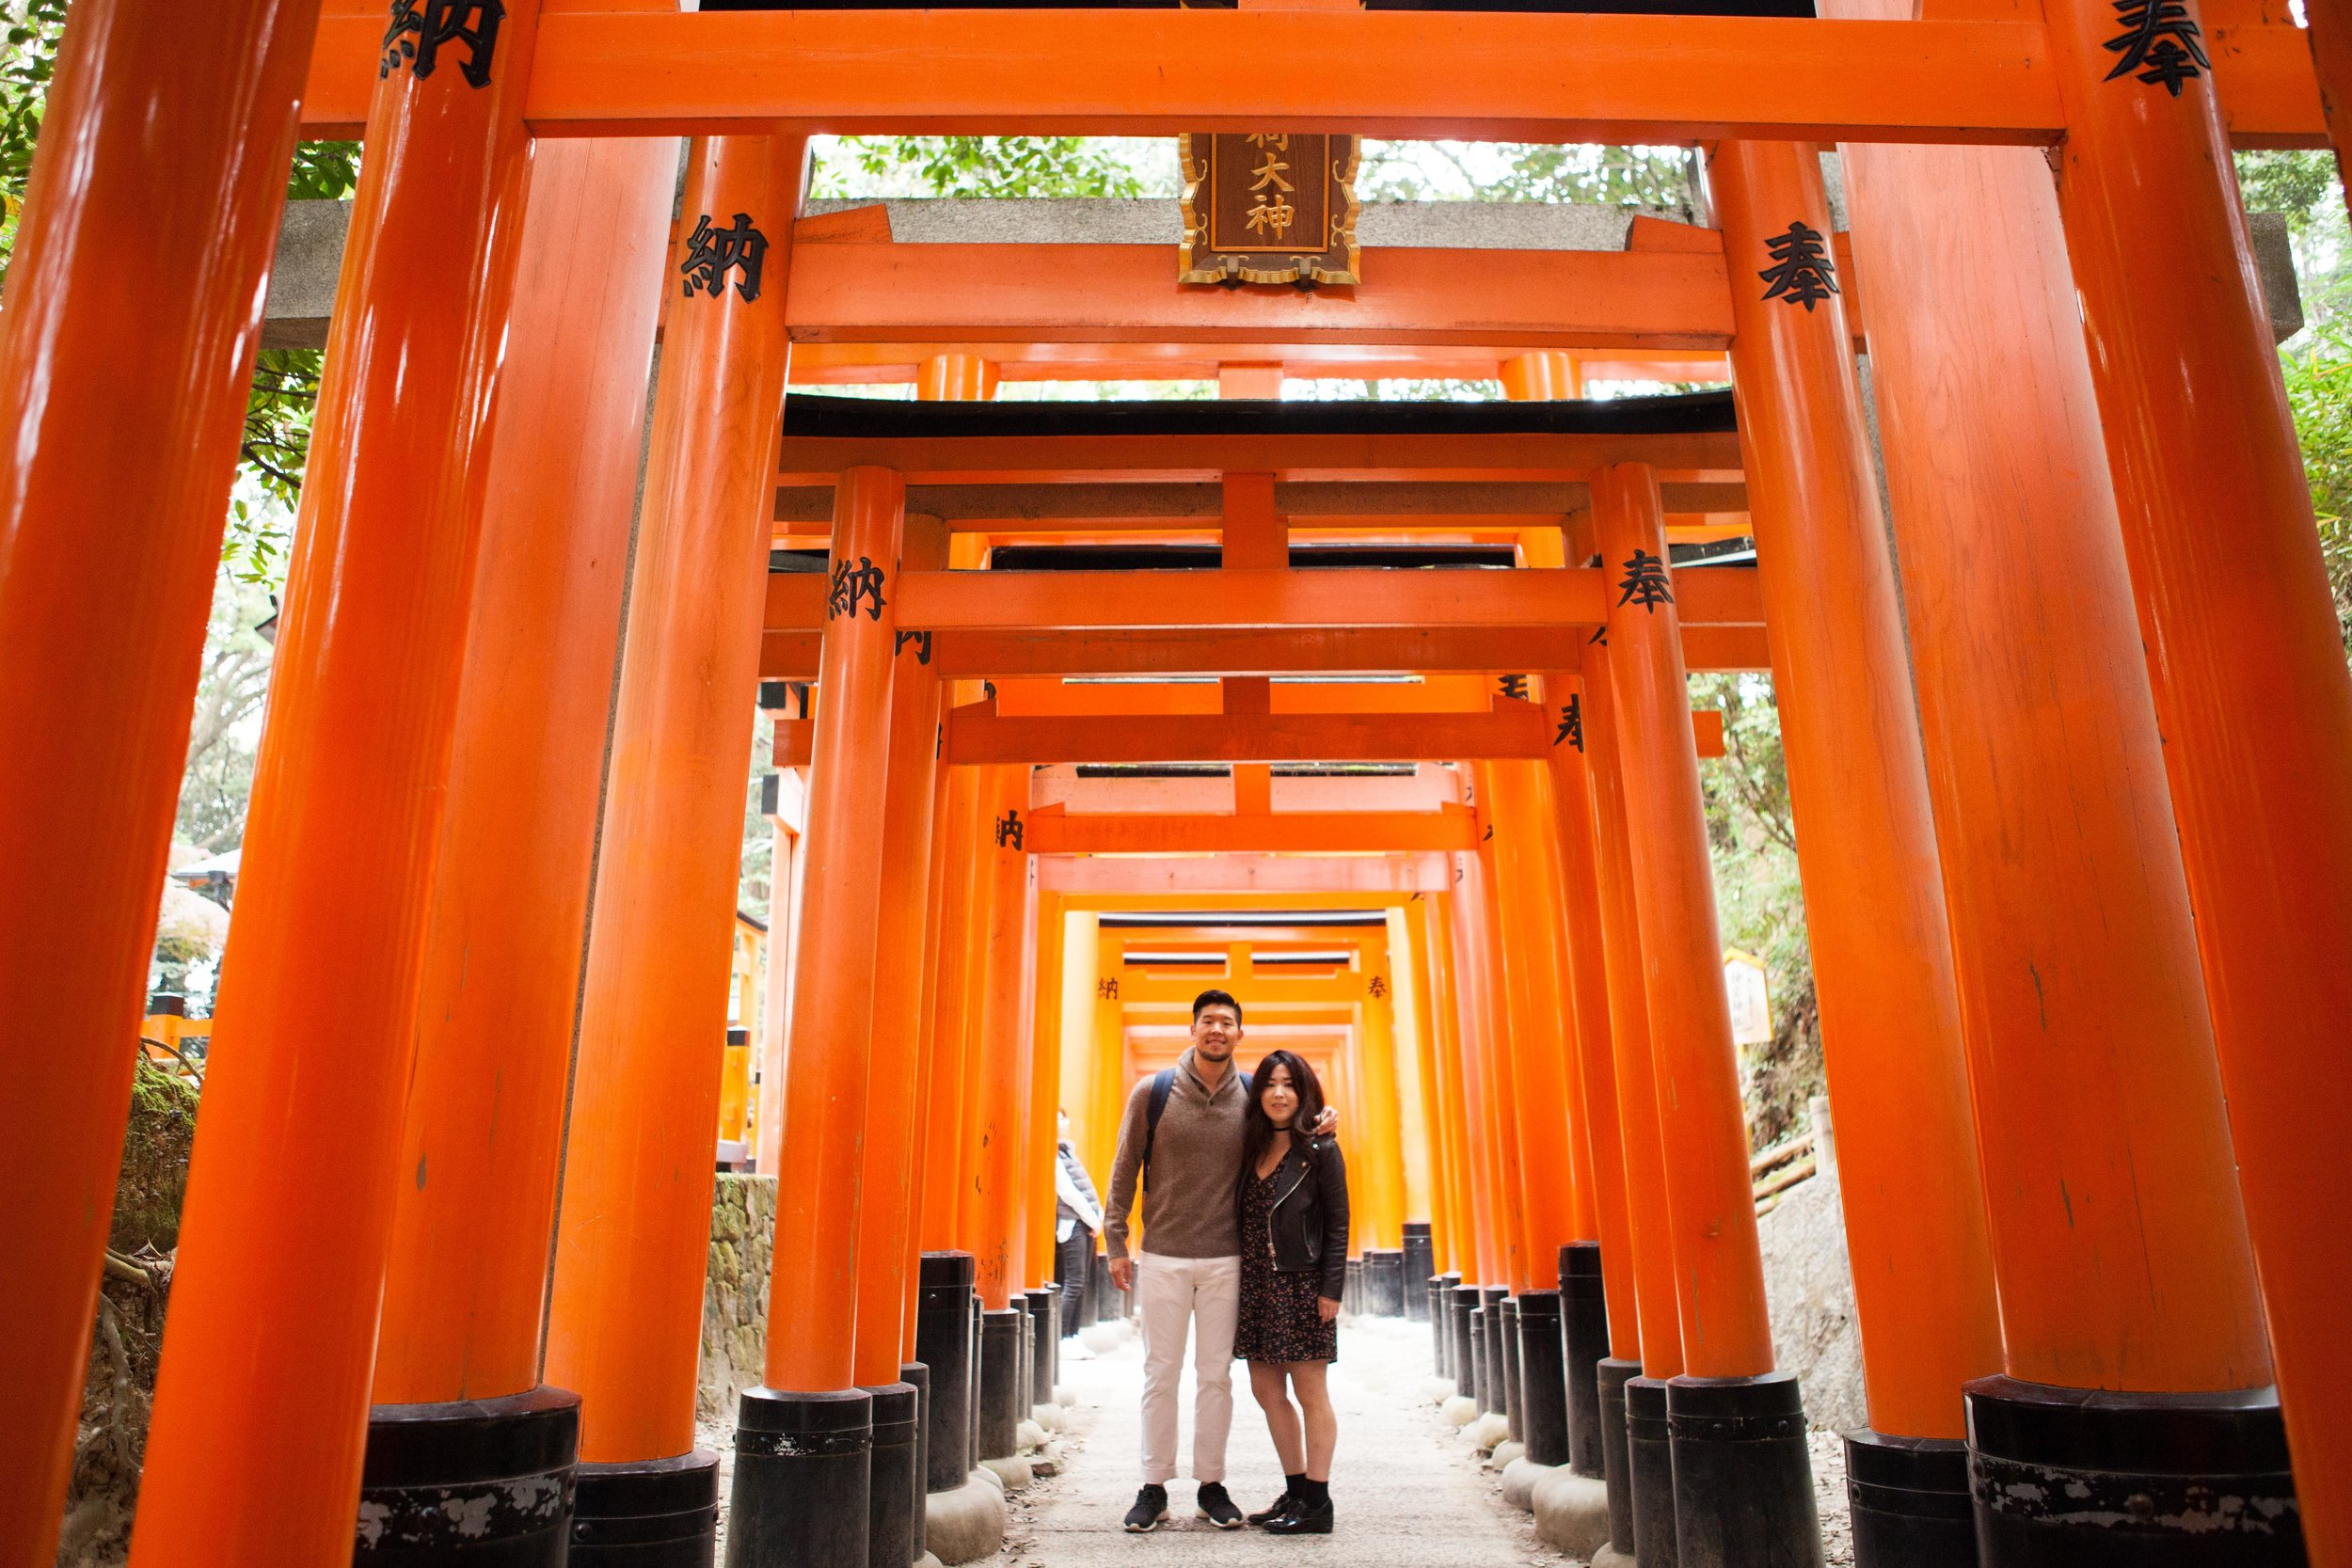 2016-10-23 Asia Trip_Japan-64.jpg